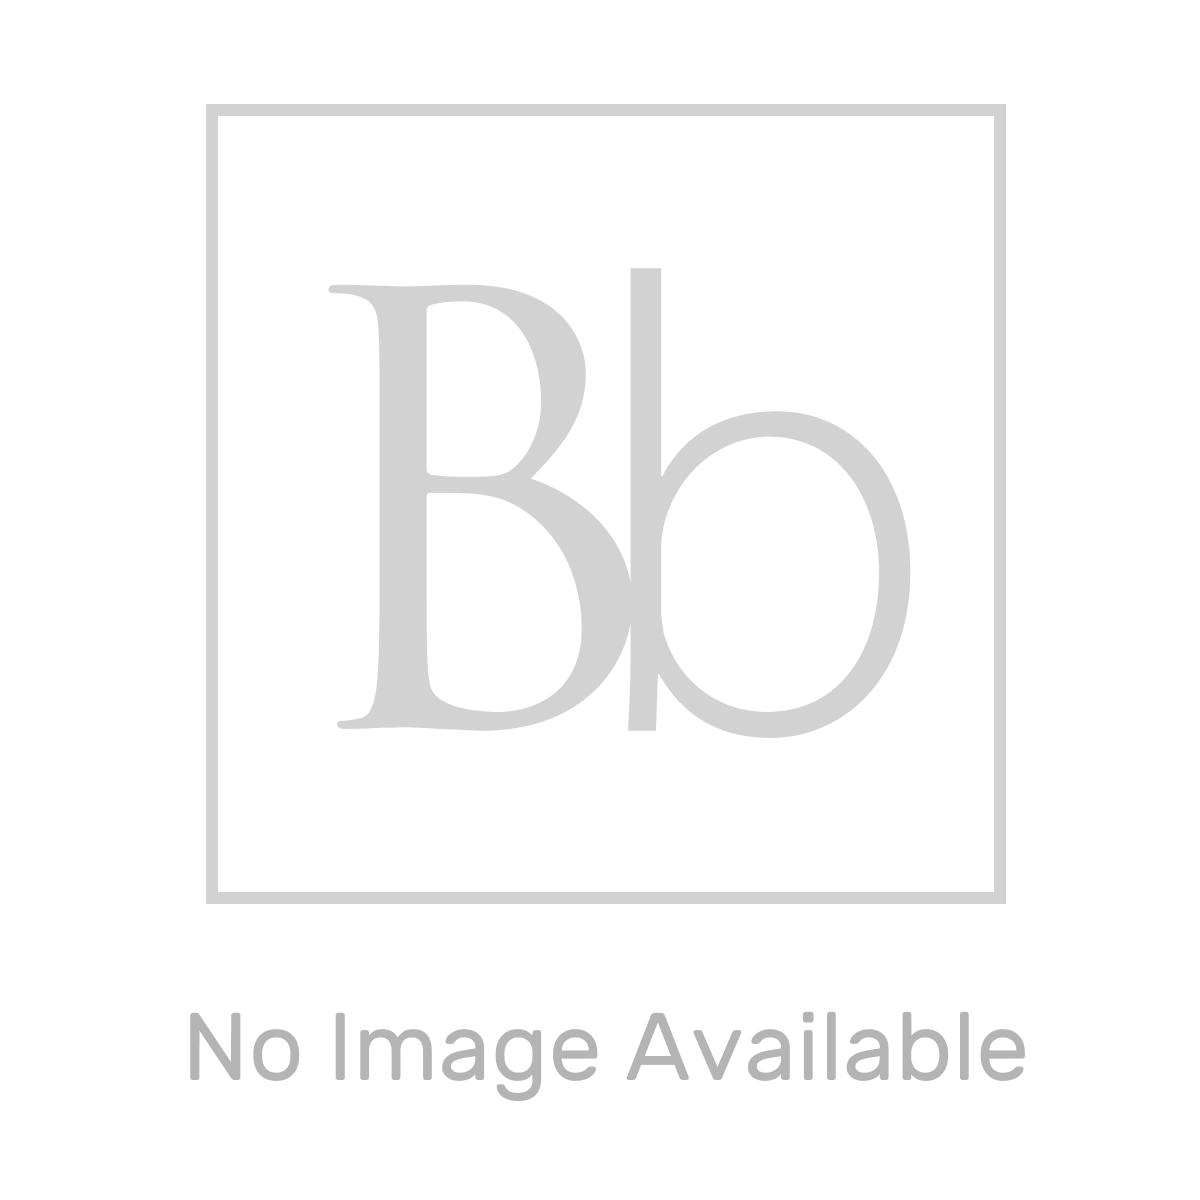 Mito Floor Standing Vanity Unit 500mm Line Drawing 1